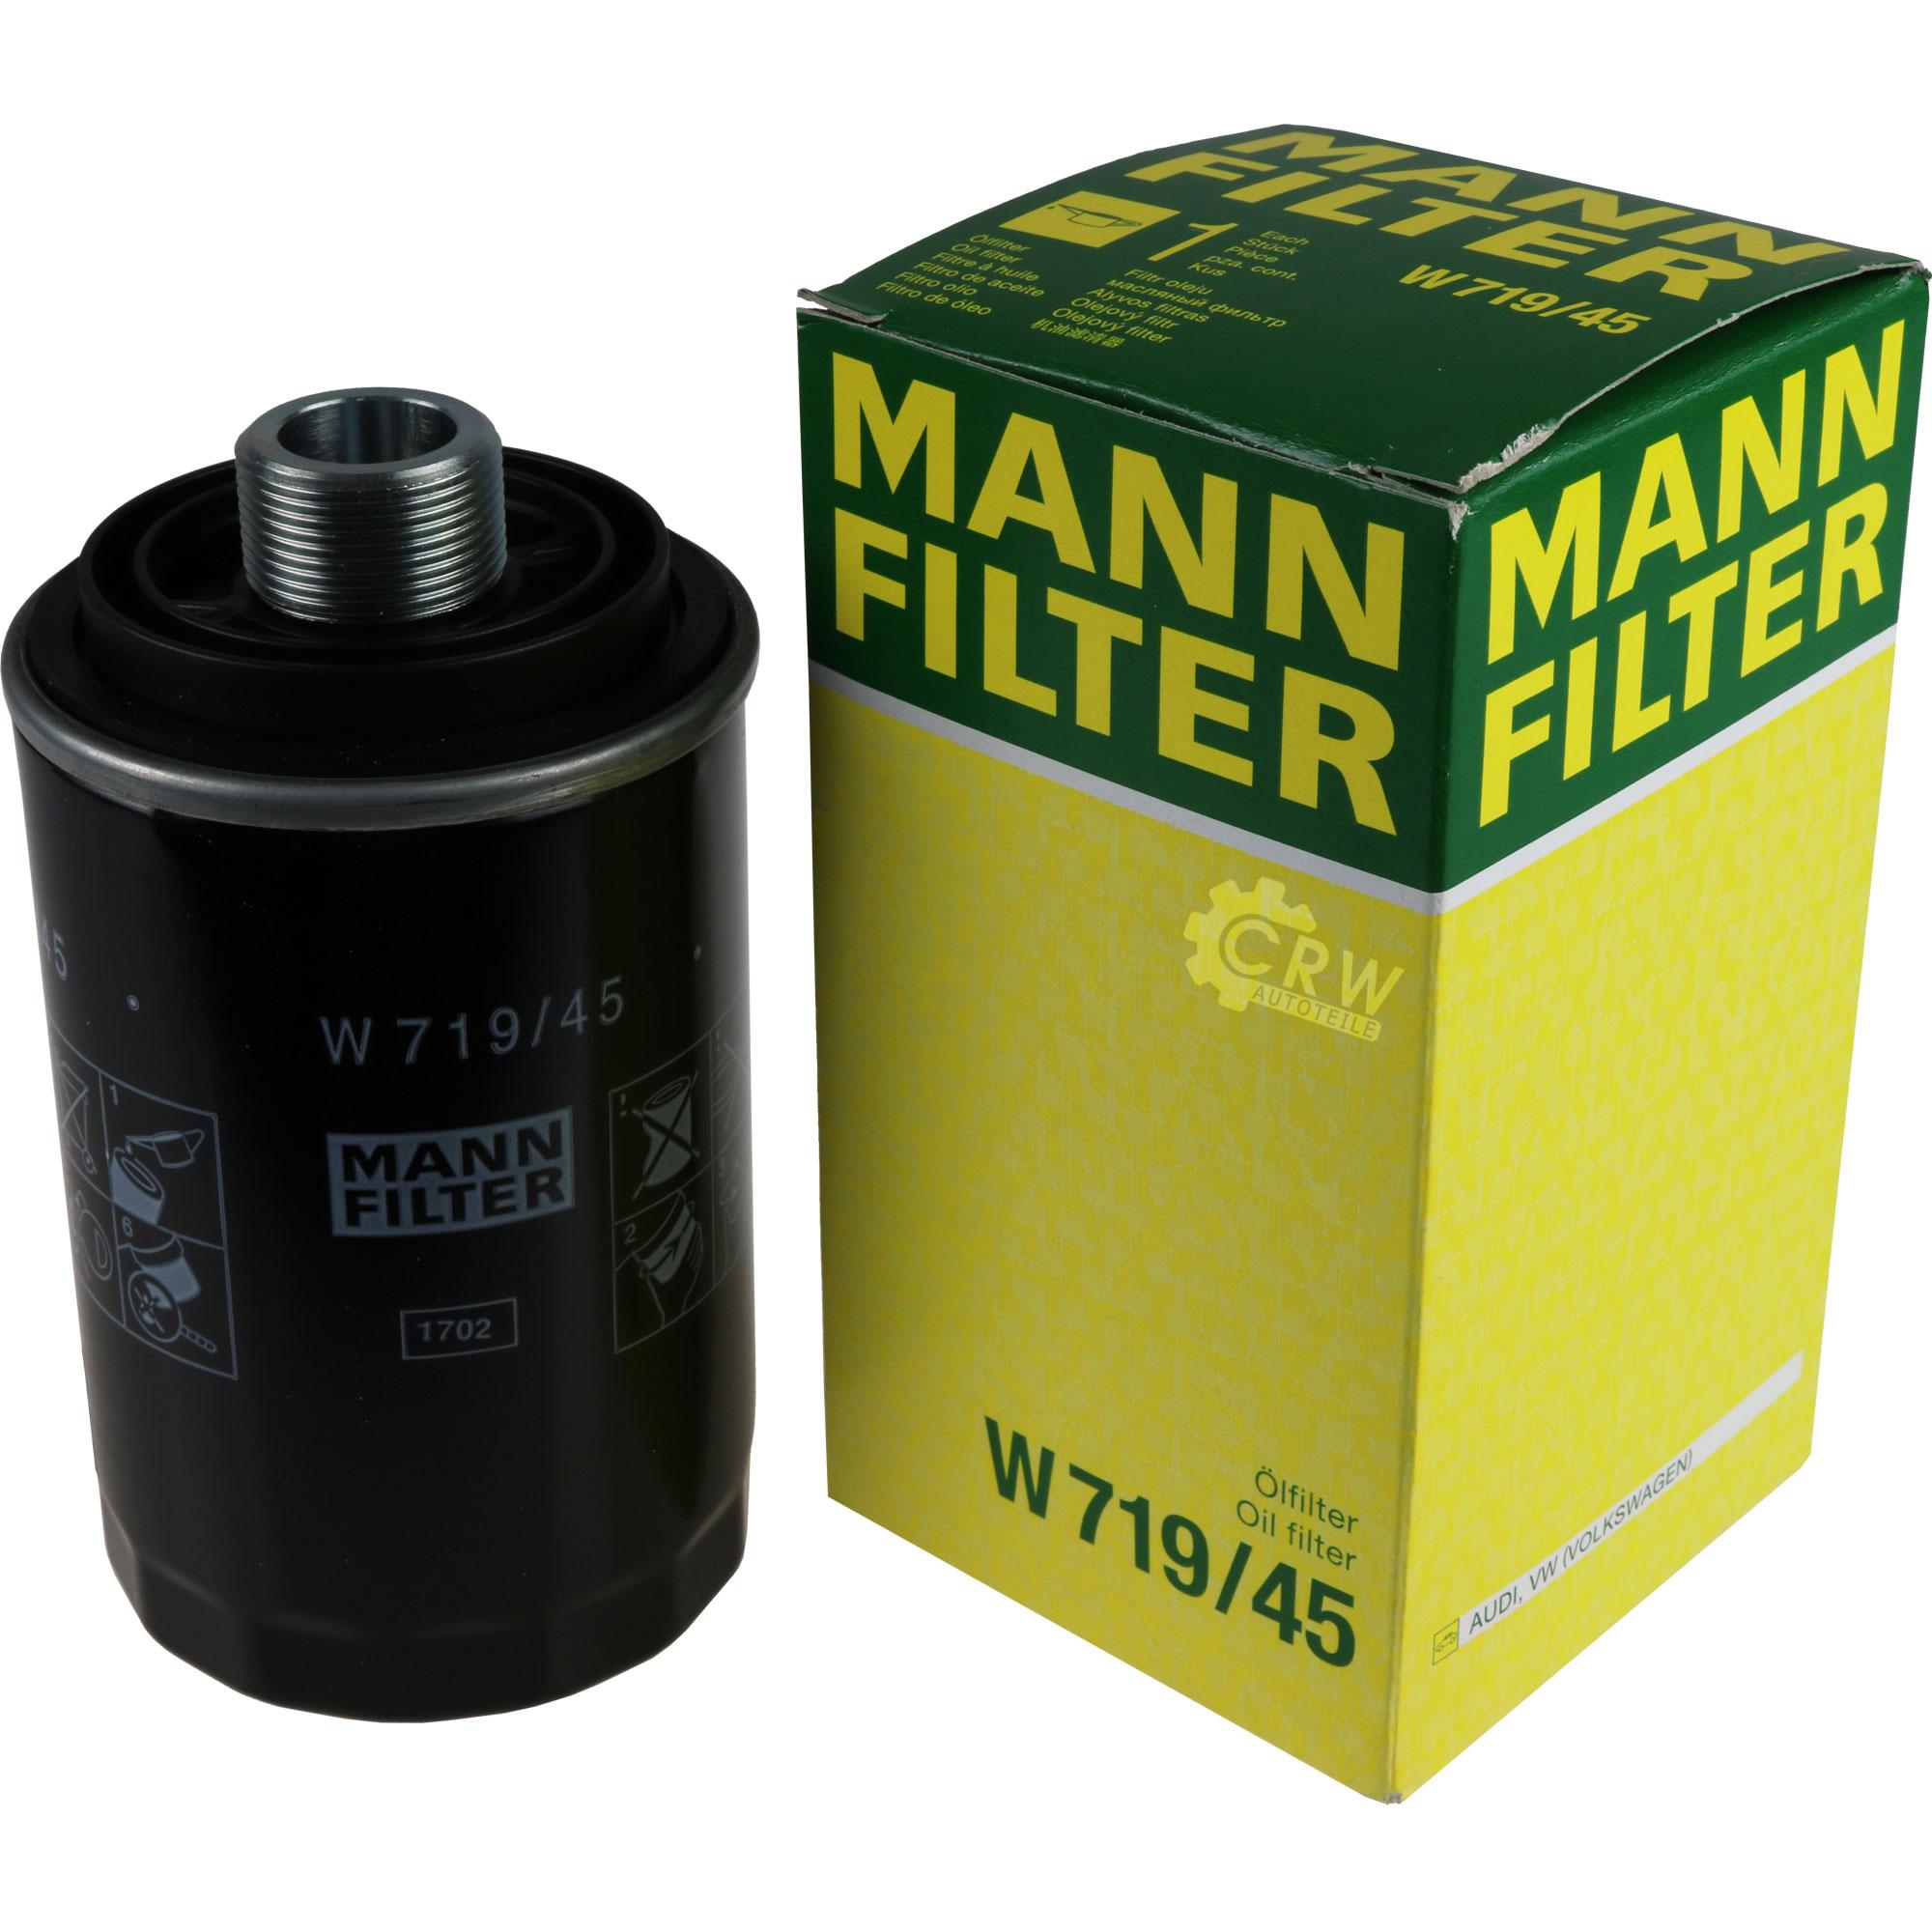 MANNOL-5-l-energy-premium-5w-30-Mann-Filter-skoda-superb-3t4-1-8-ETI-4x4 miniatura 5